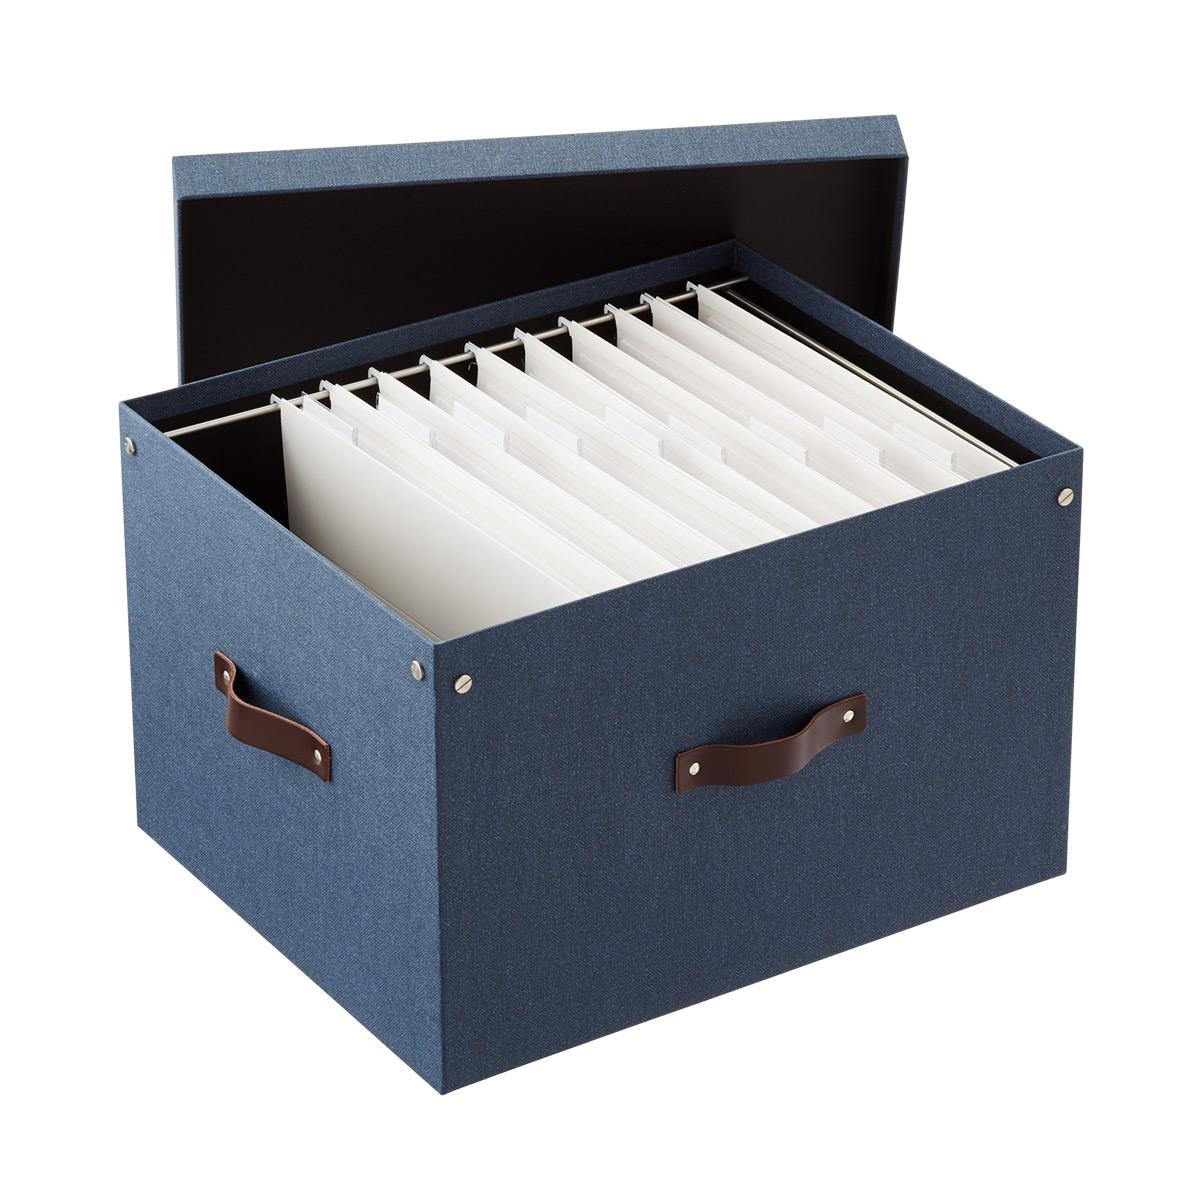 Bigso Navy Marten Letter/Legal File Storage Box